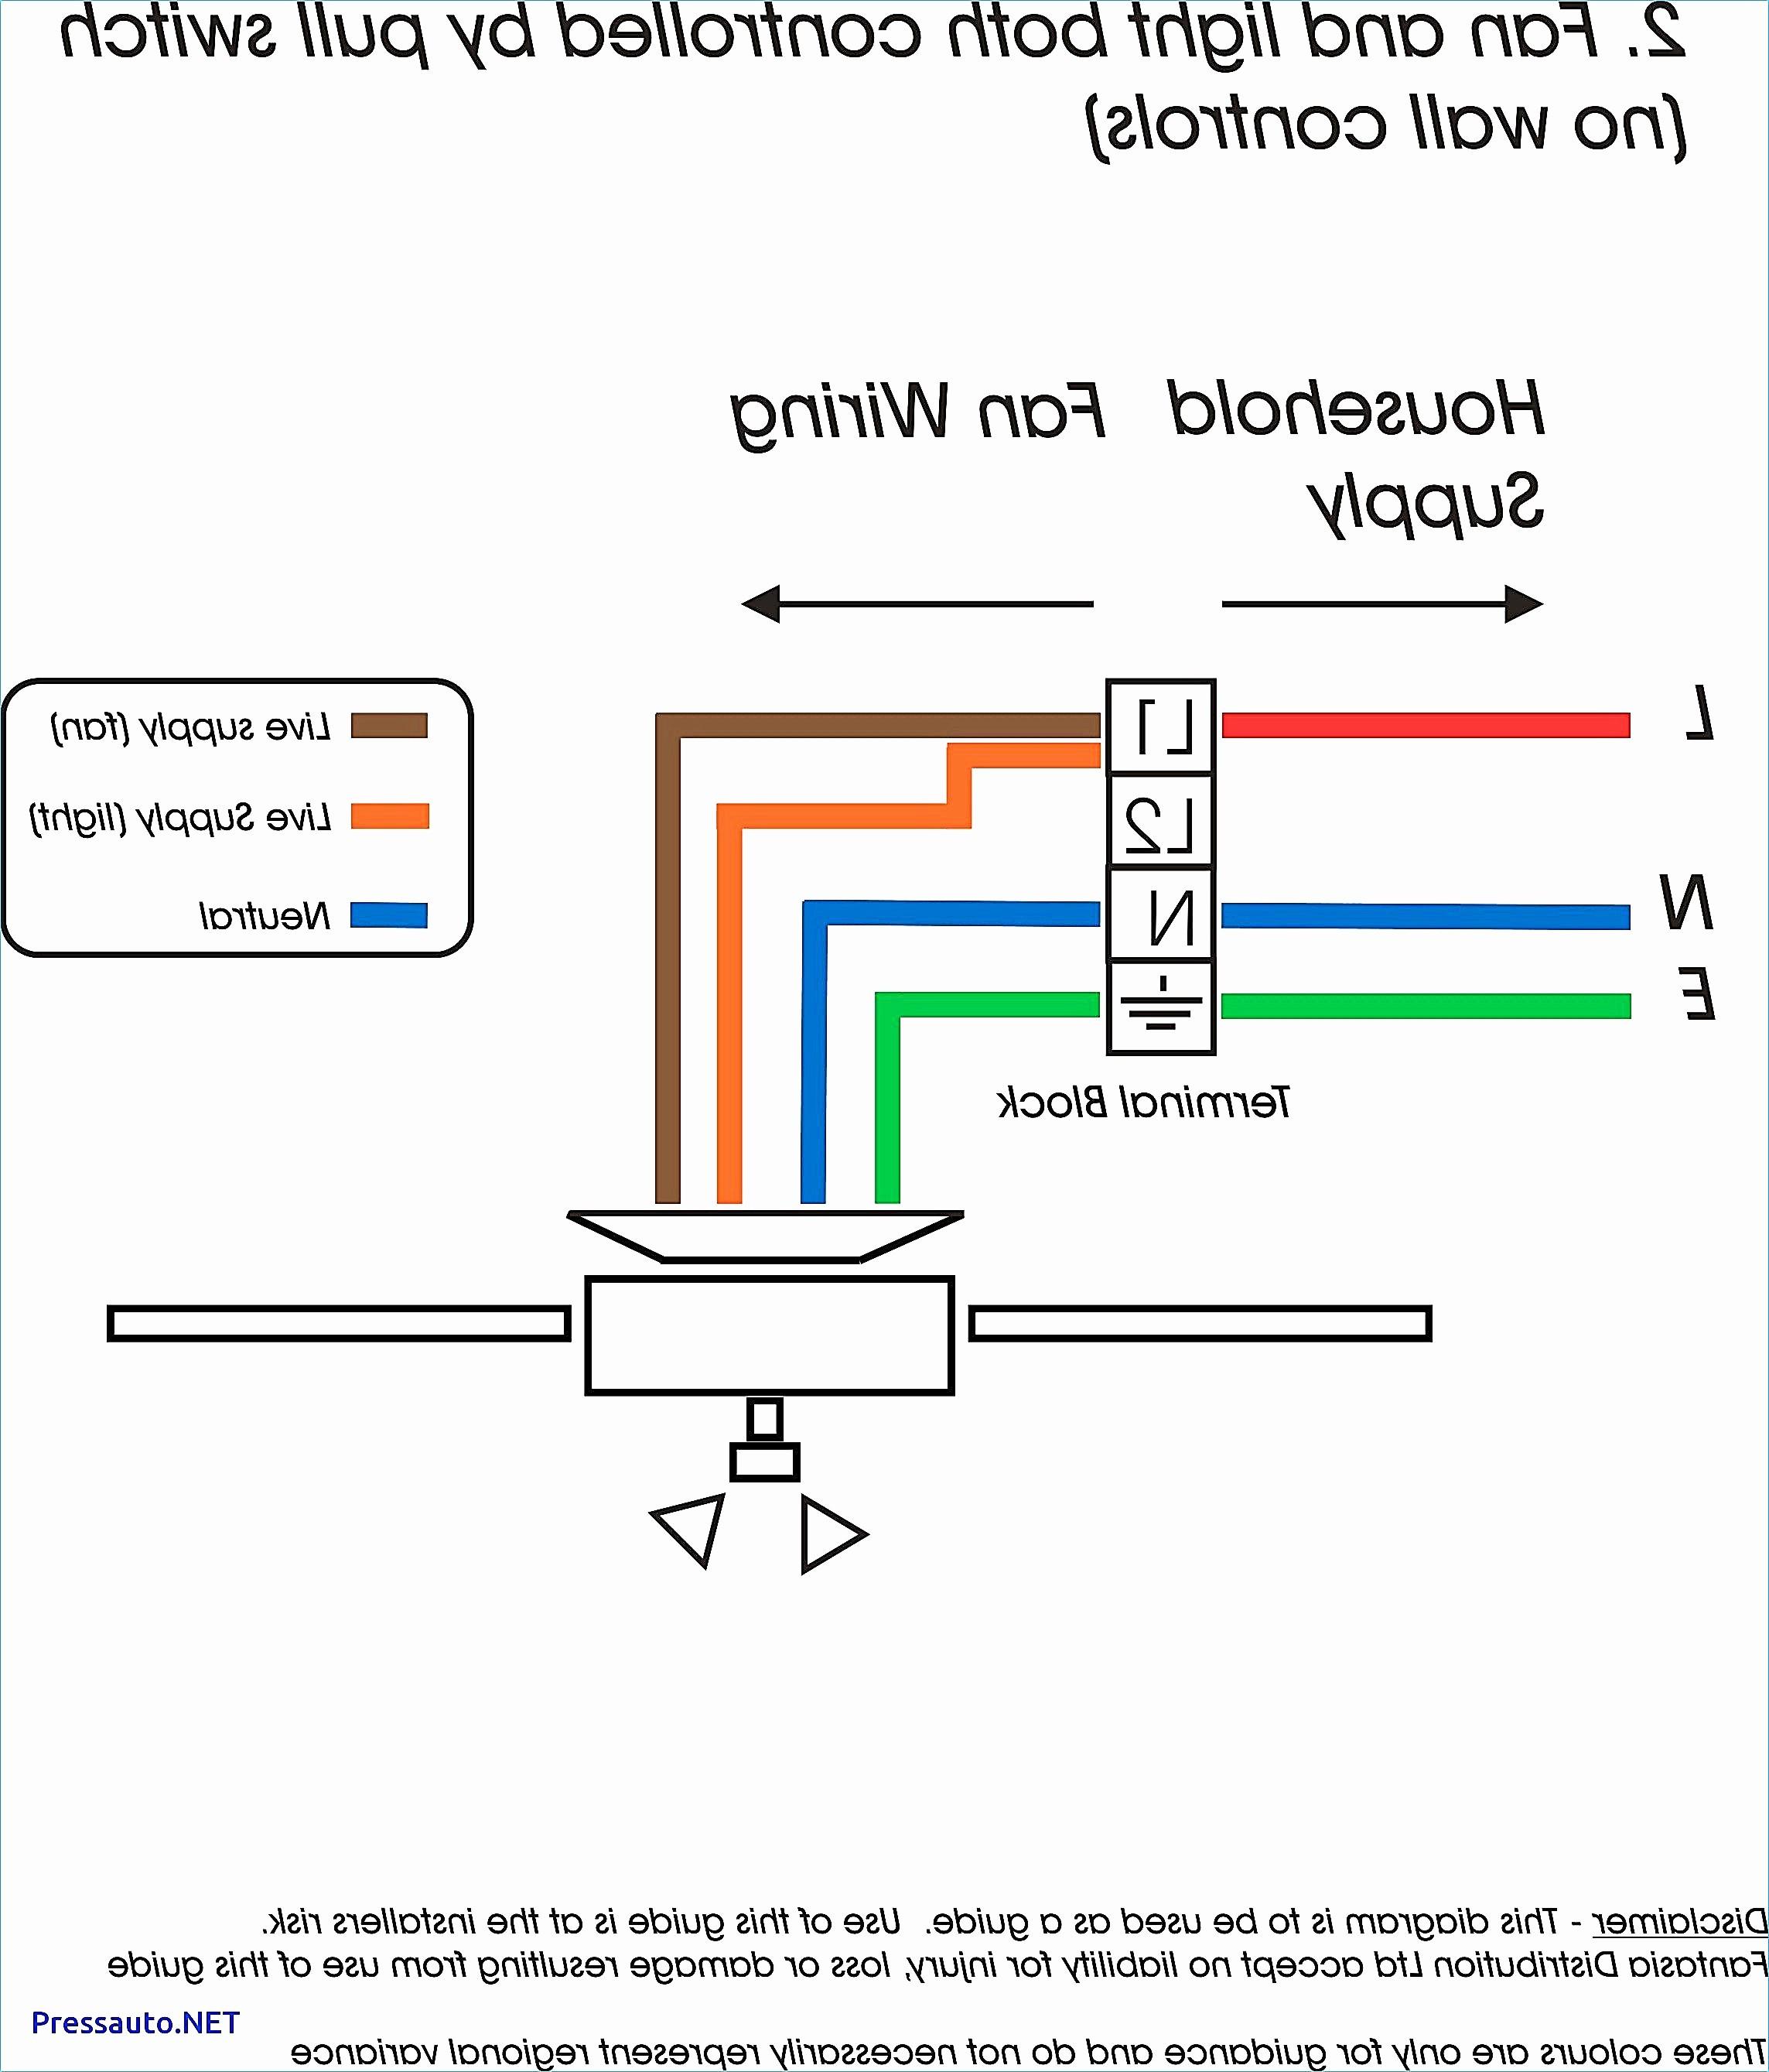 Headlight Switch Wiring Diagram Double Light Switch Wiring Diagram Beautiful Excellent Double Light Of Headlight Switch Wiring Diagram